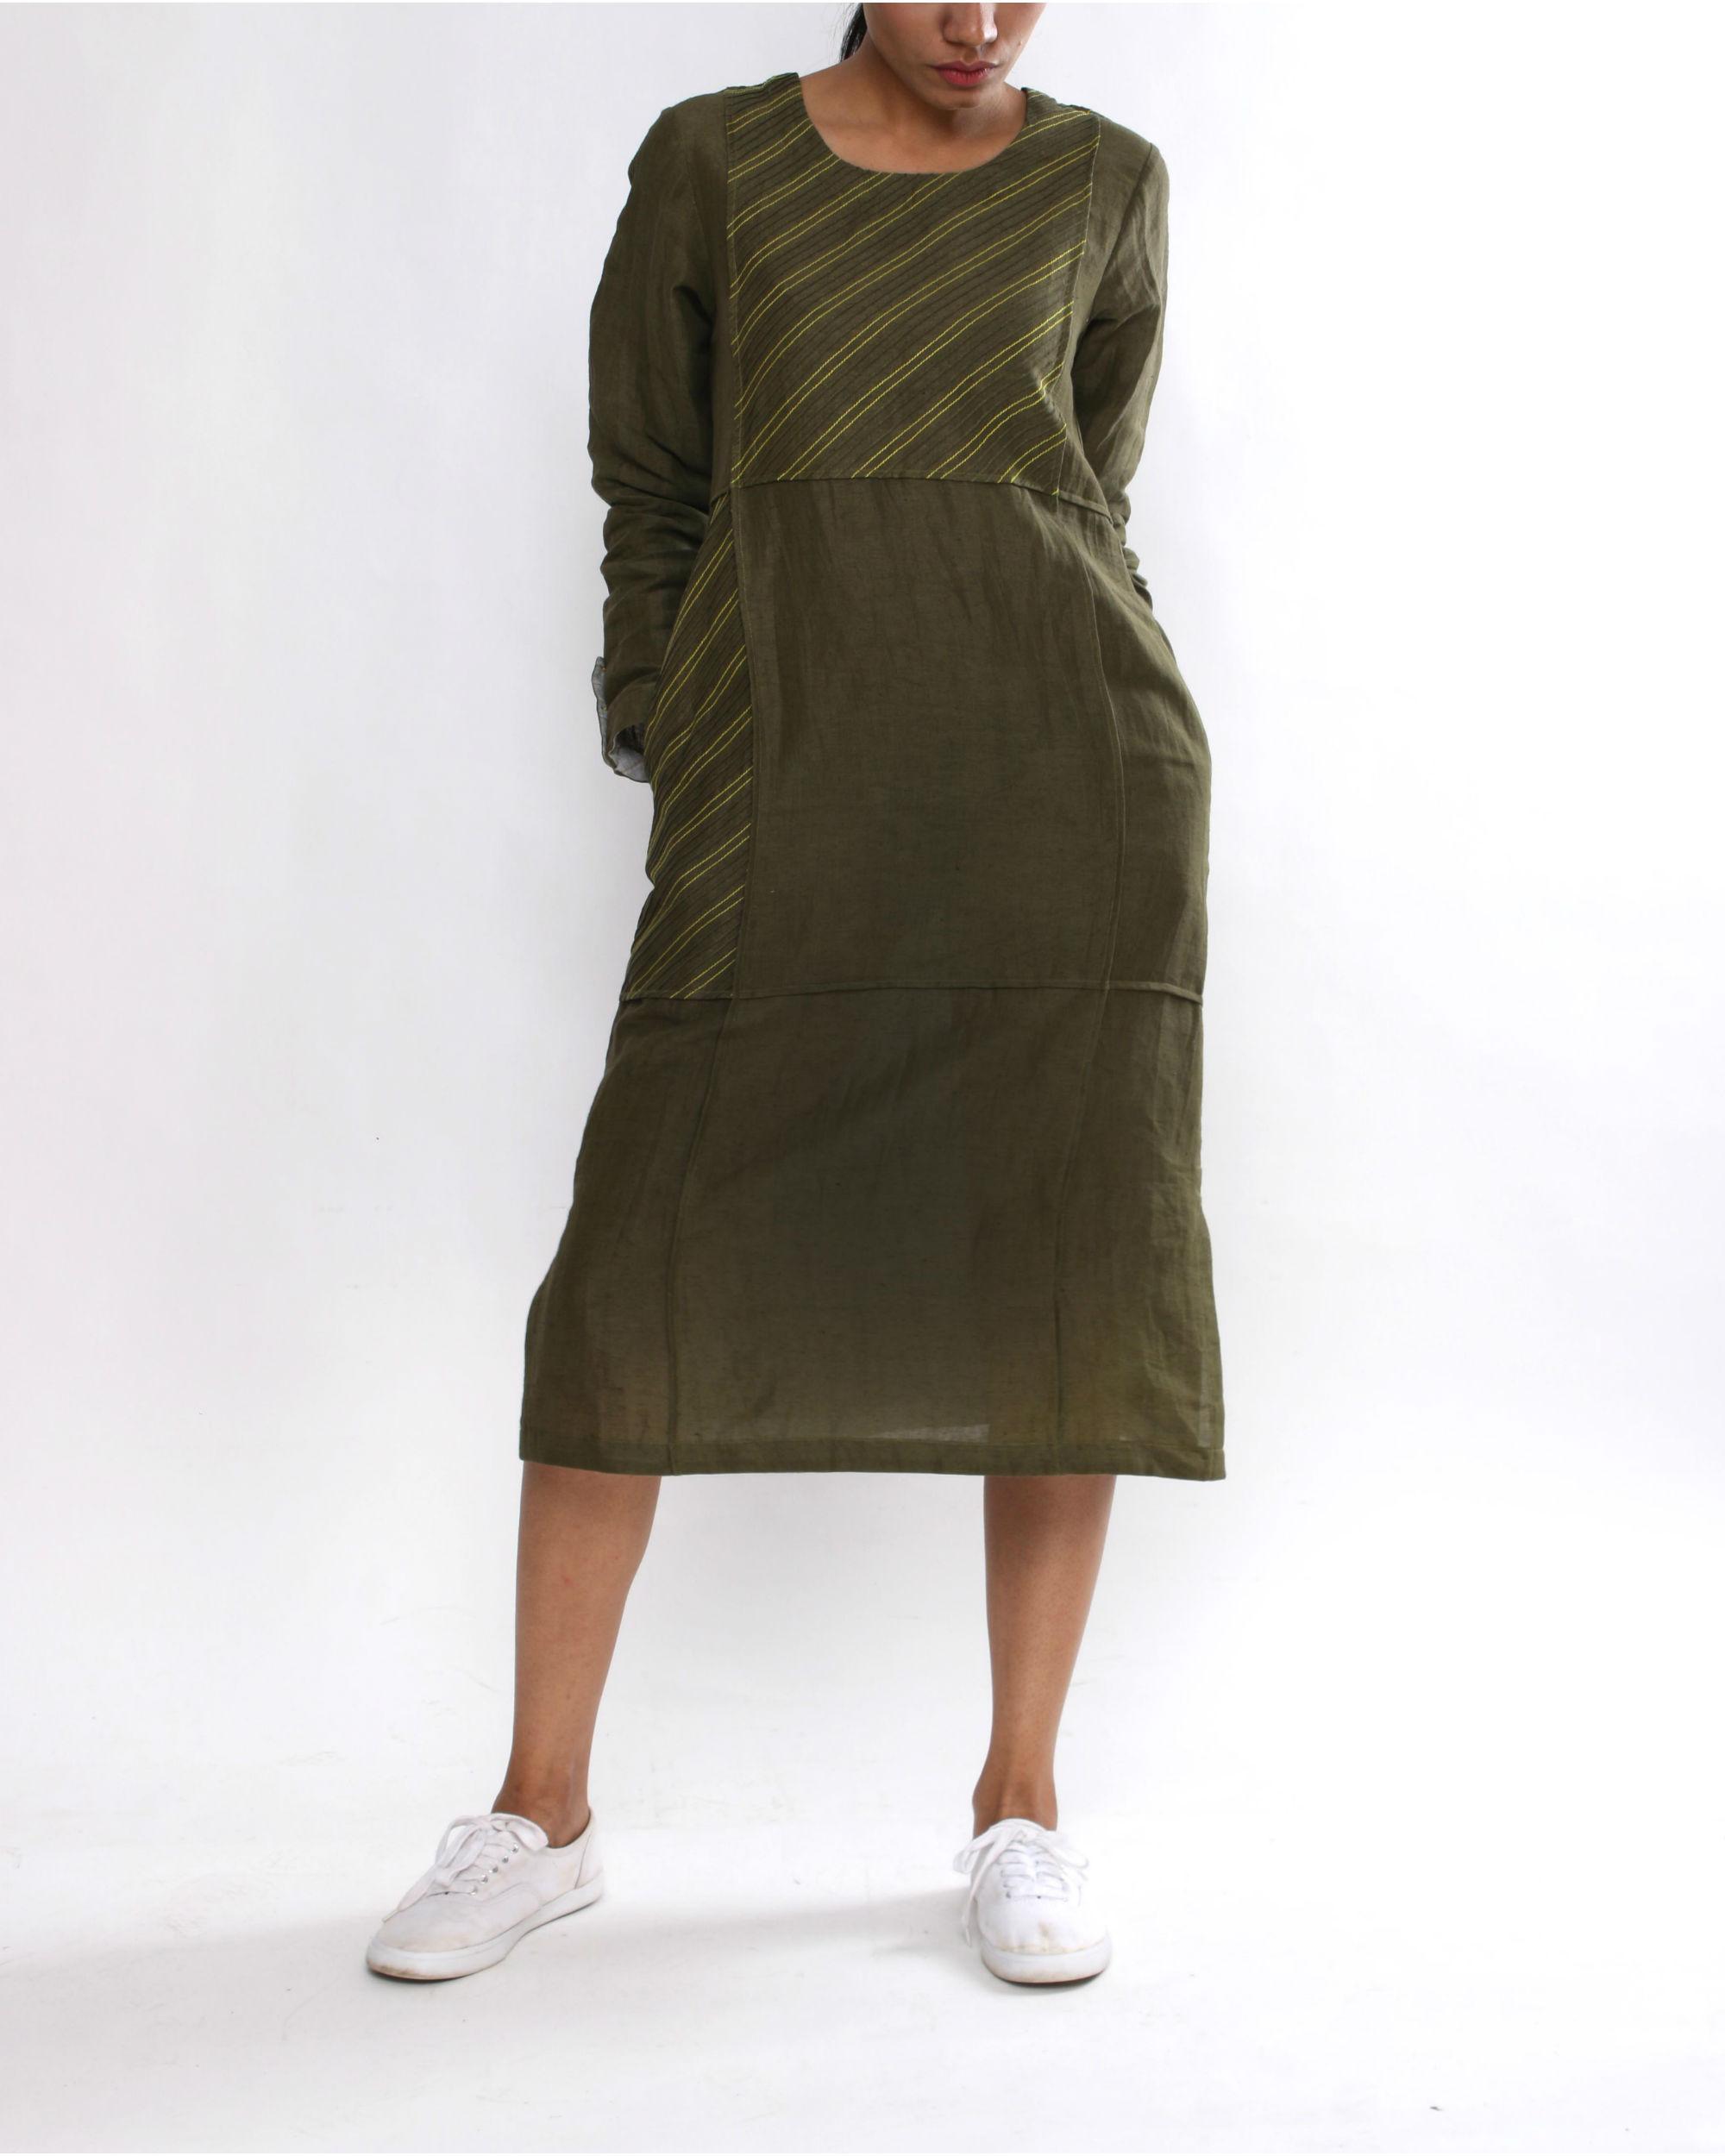 Olive panel dress